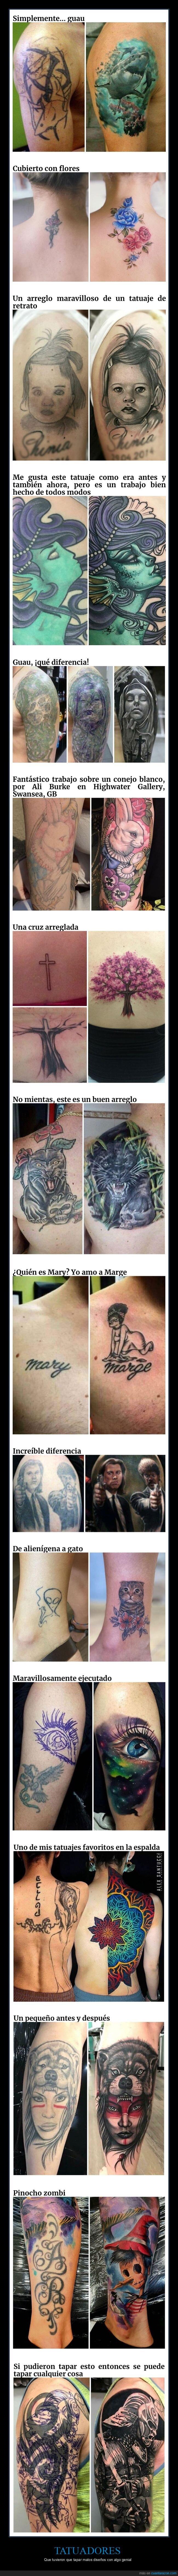 rediseños,tapar,tatuajes